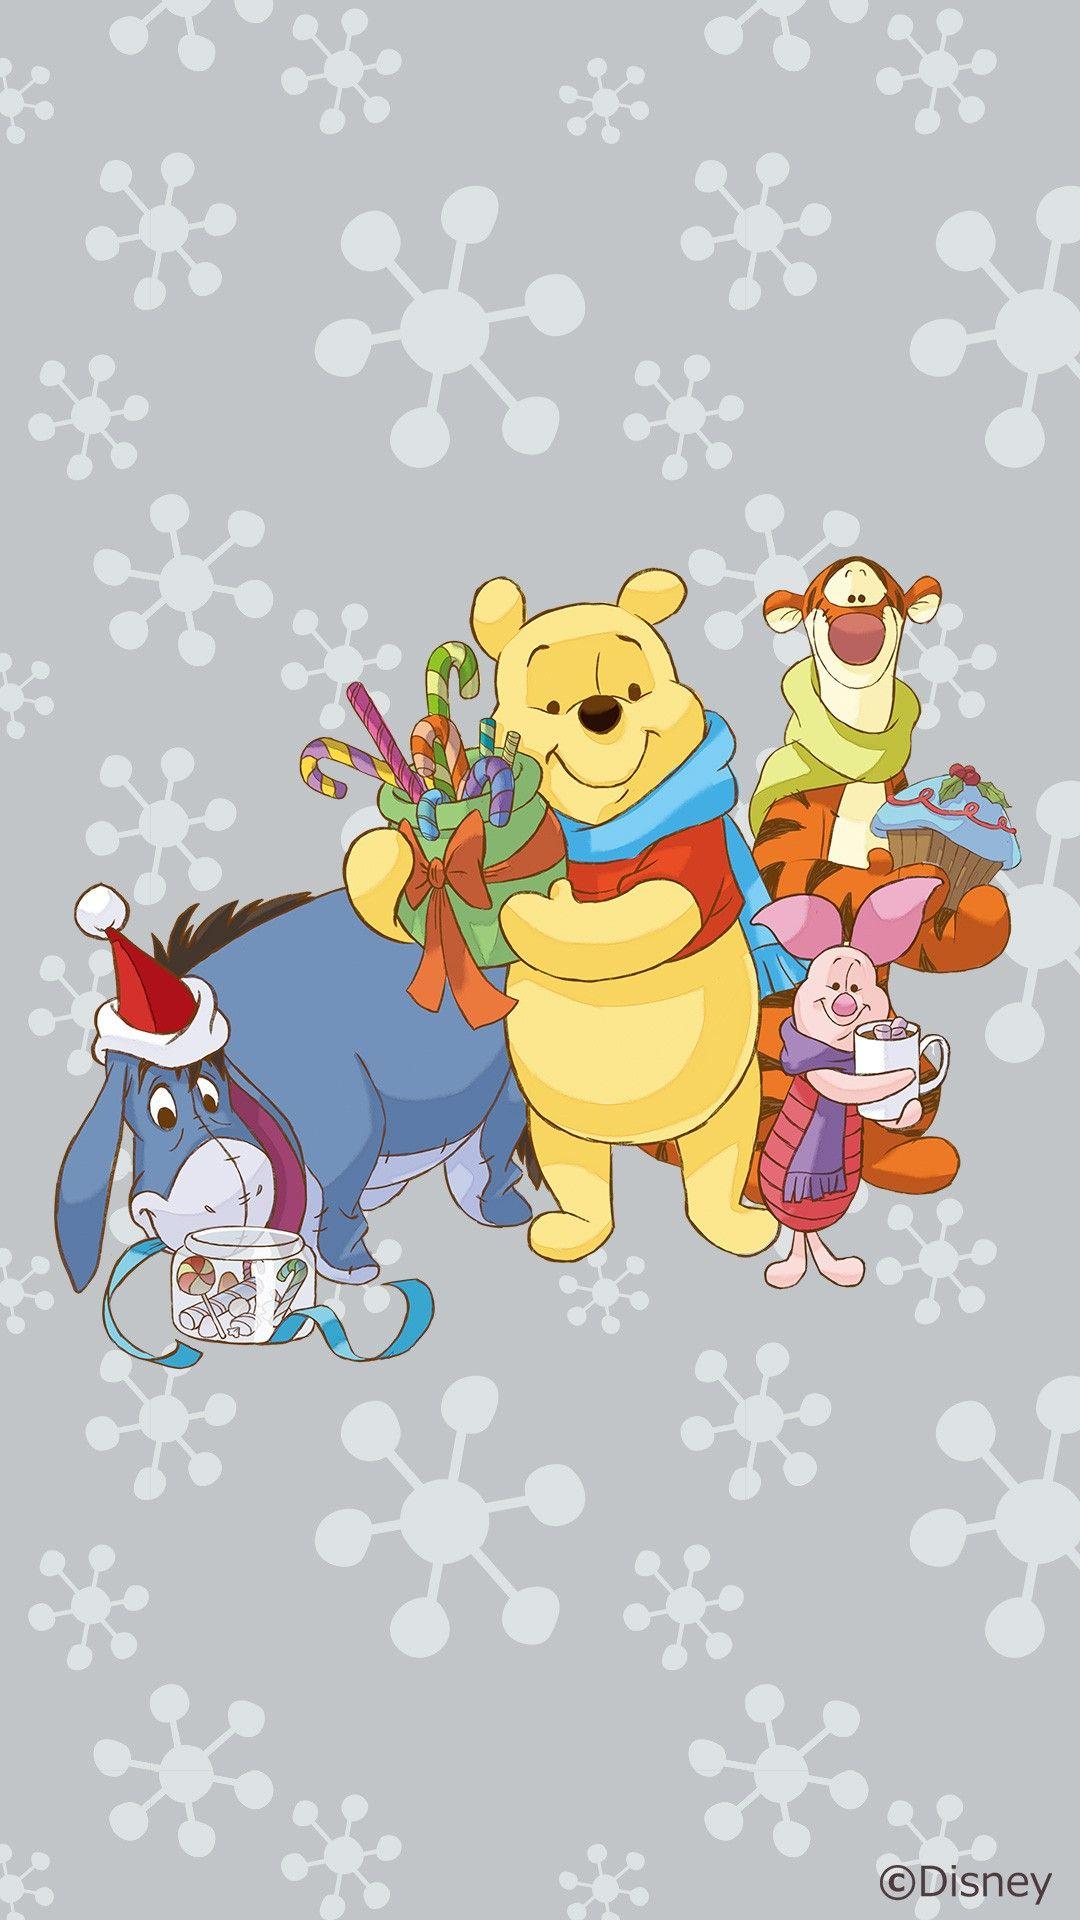 Winnie The Pooh Cute Winnie The Pooh Winnie The Pooh Winnie